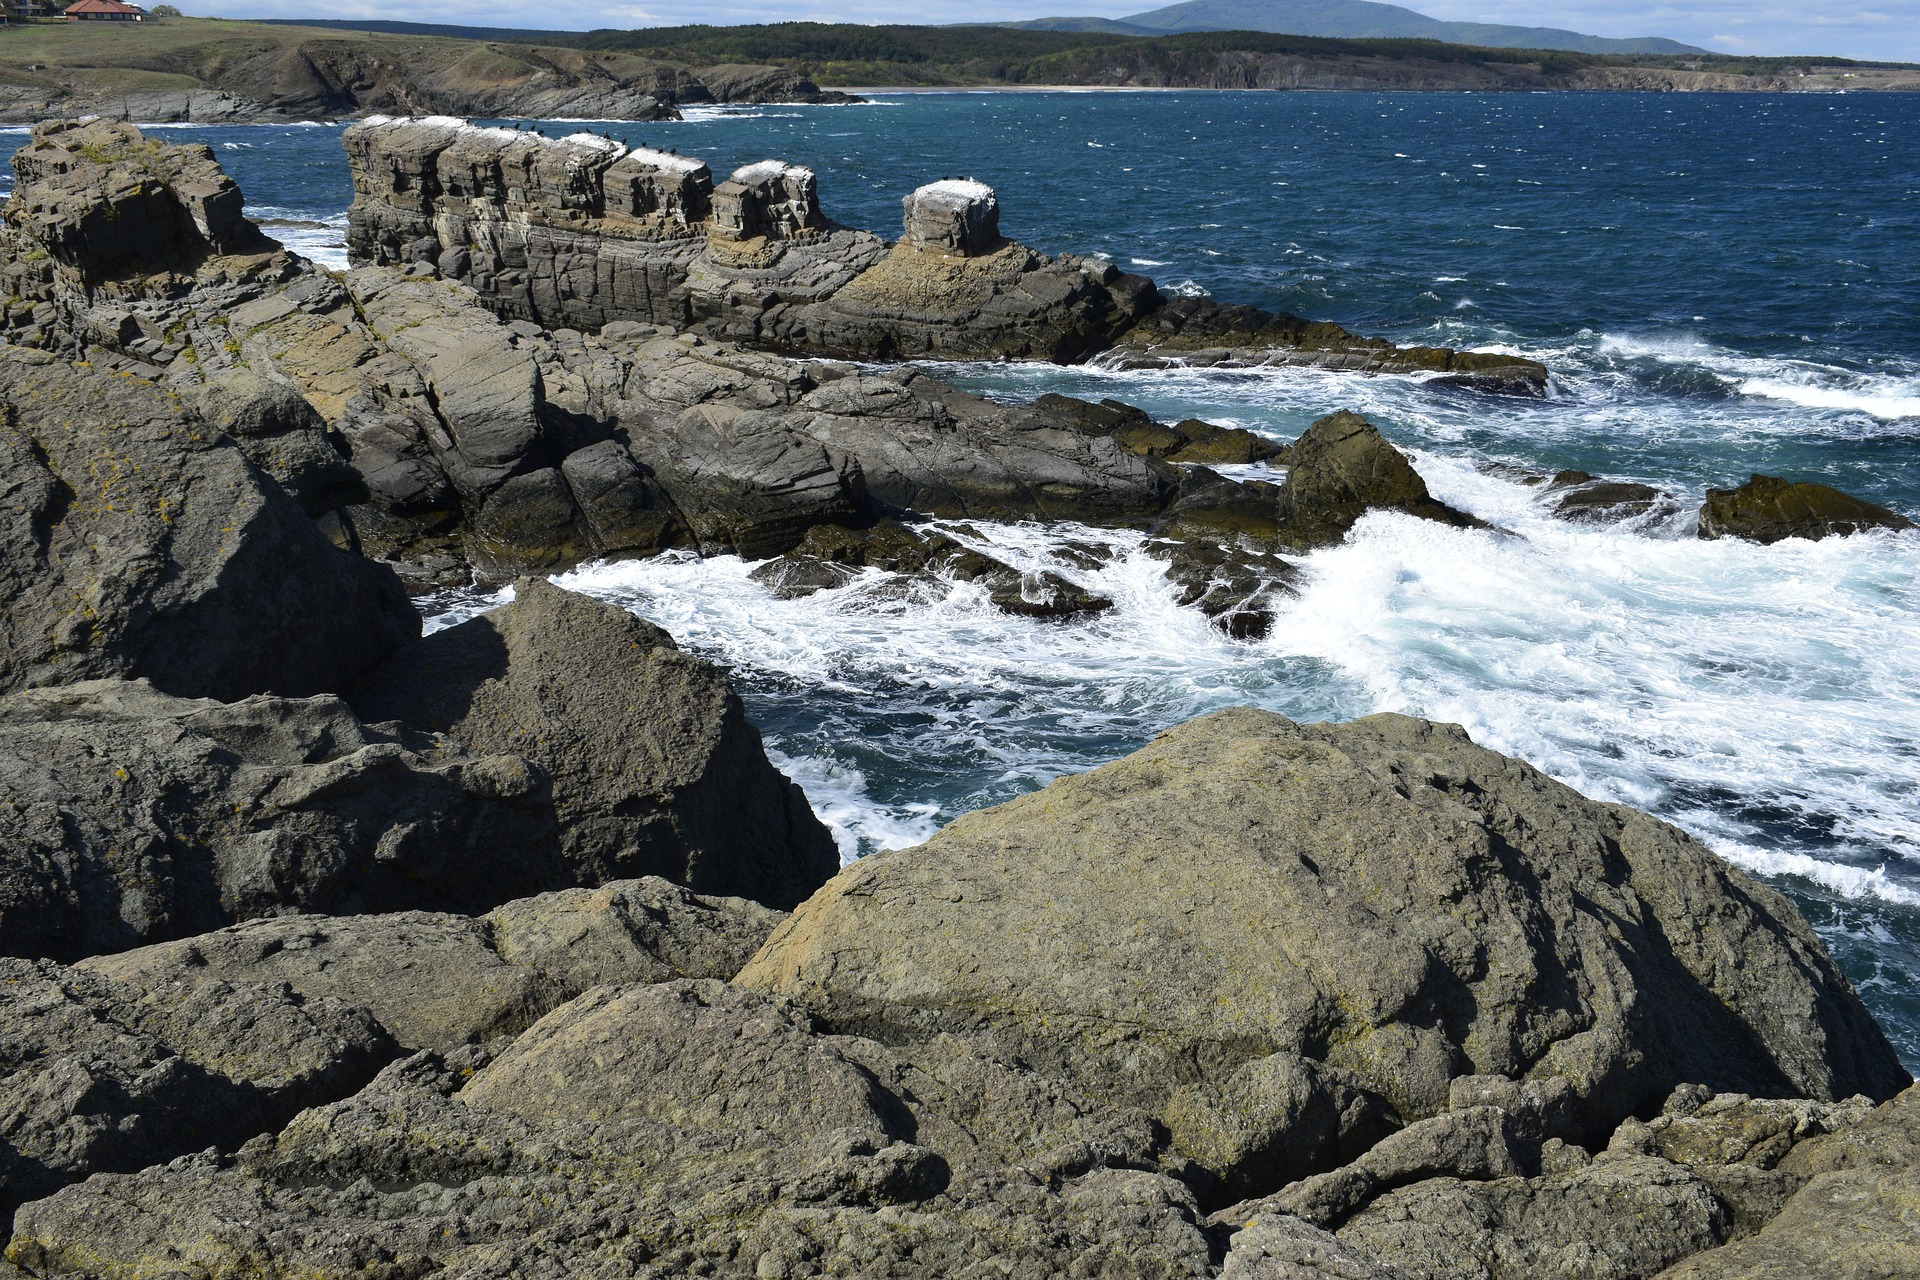 Sinemorets coast